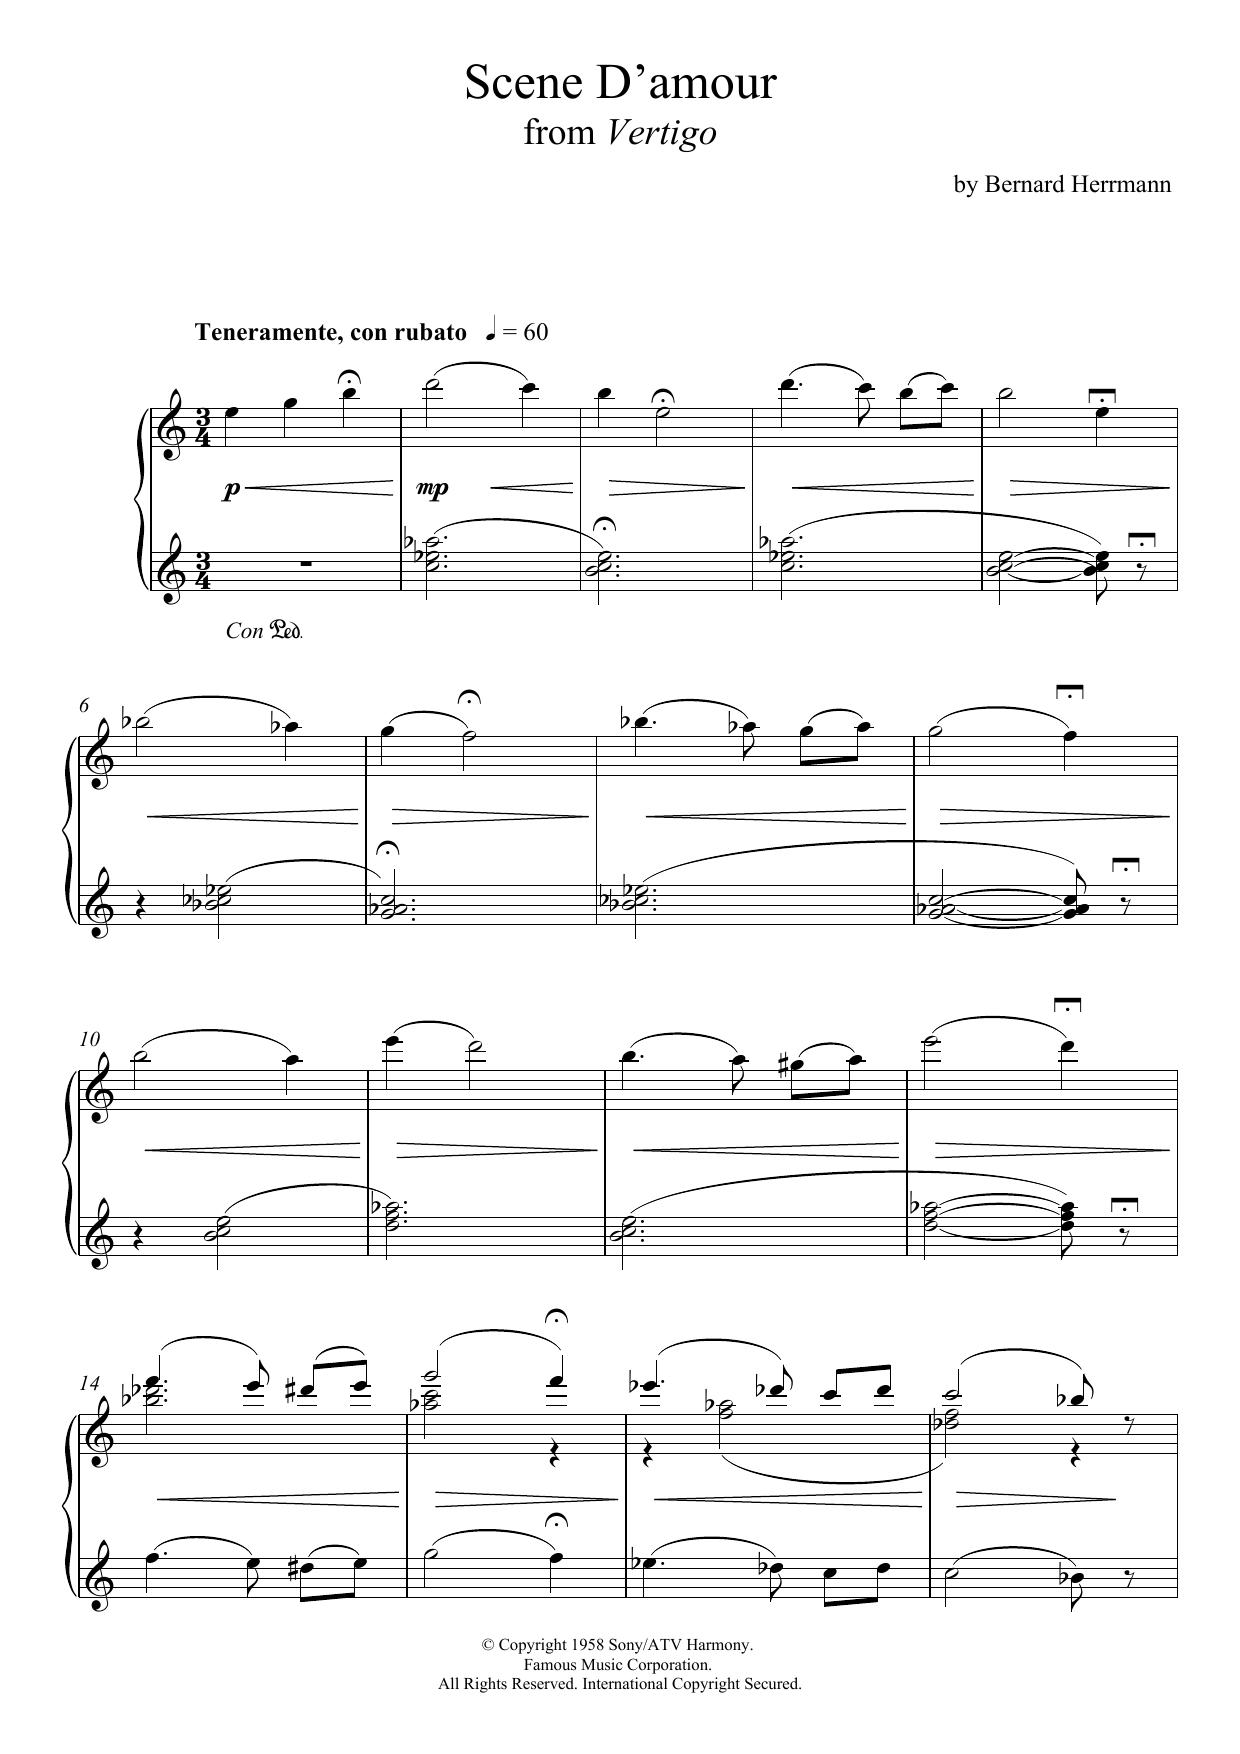 Scene D'amour From Vertigo Sheet Music